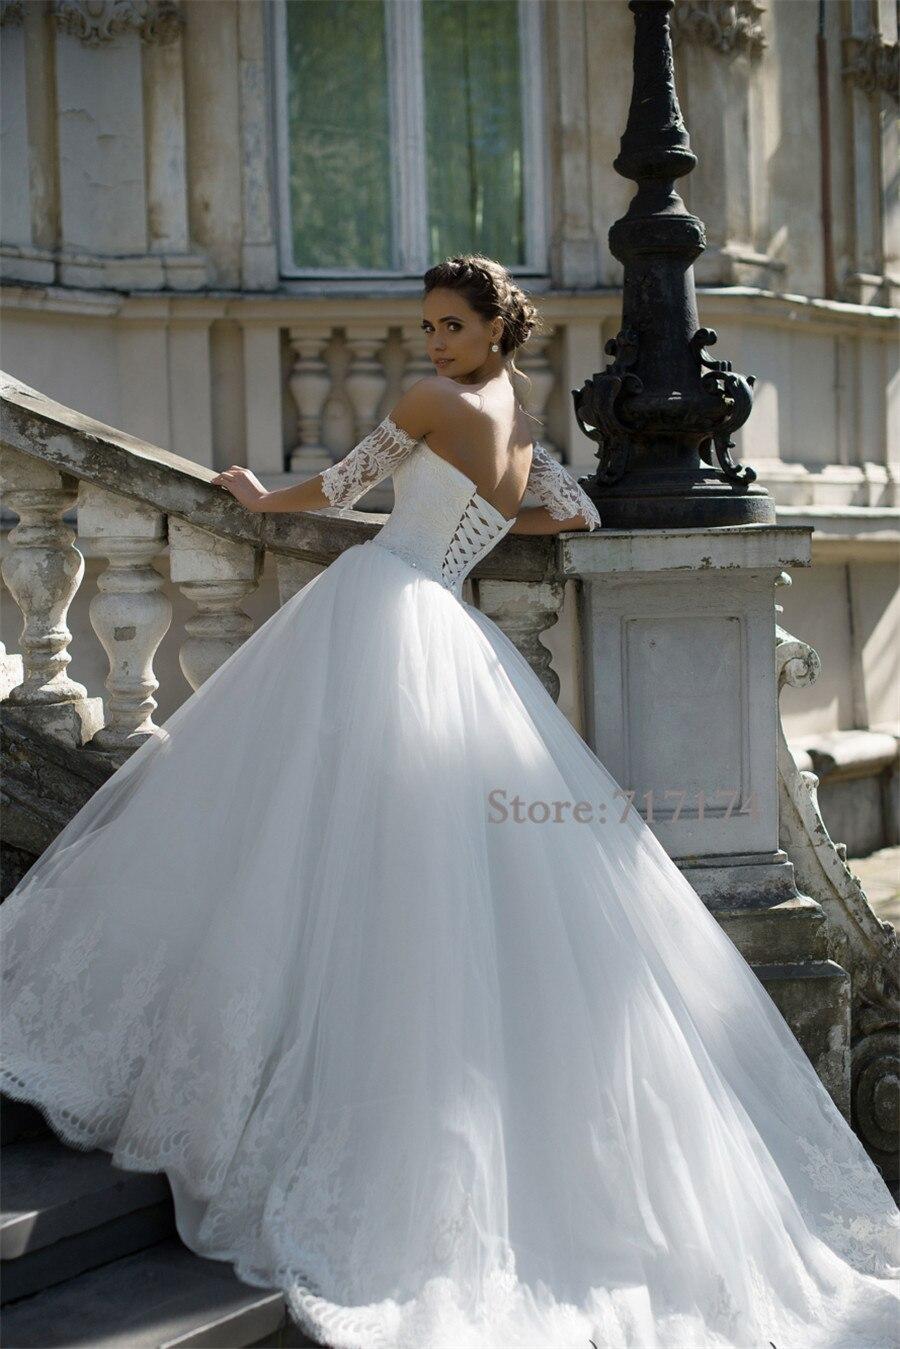 Modern Discount Wedding Dress Store Photo - All Wedding Dresses ...